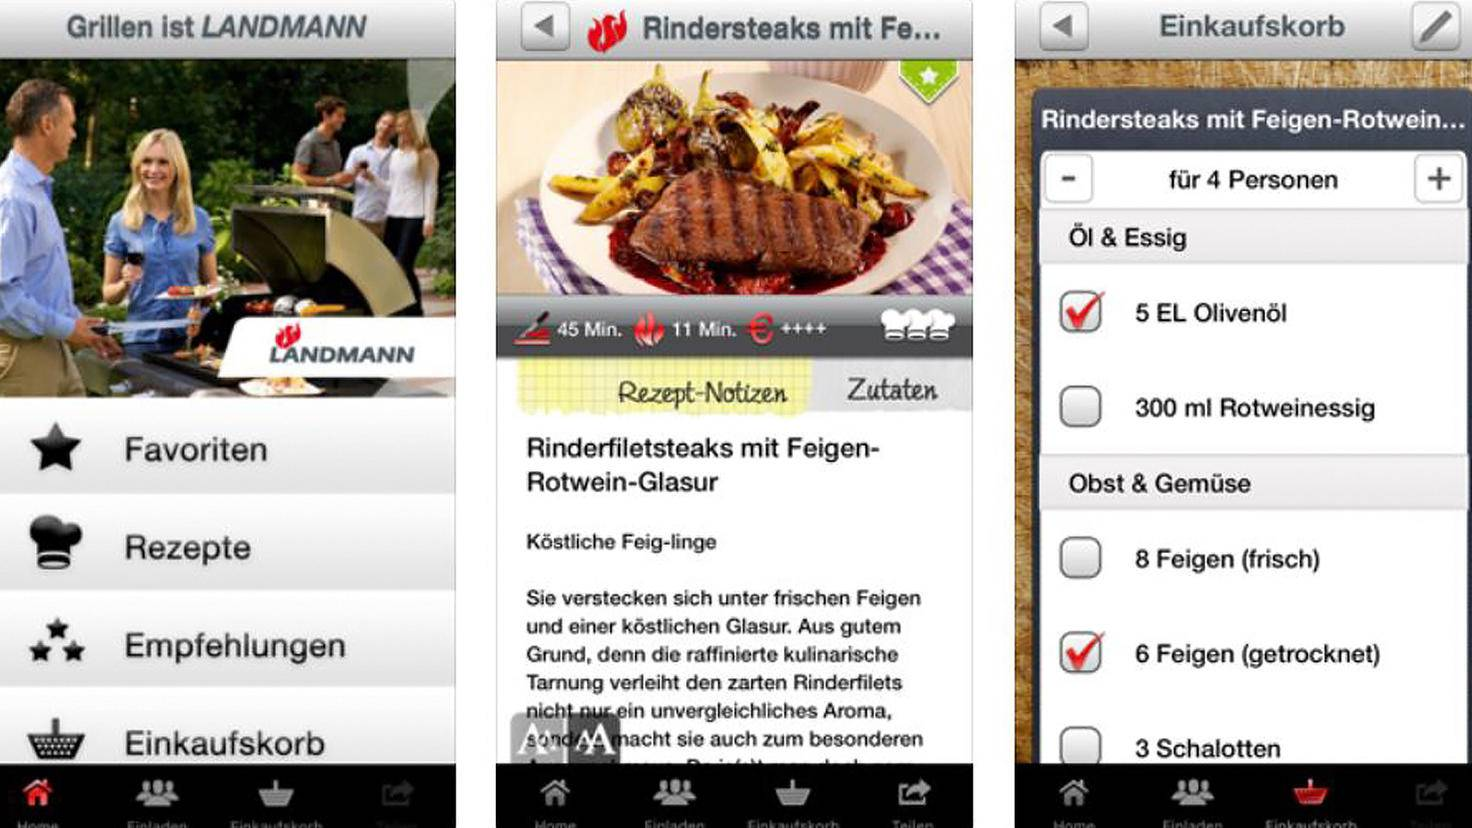 Grillen Grillrezepte App Landmann-iTunes-Mobilinga GmbH